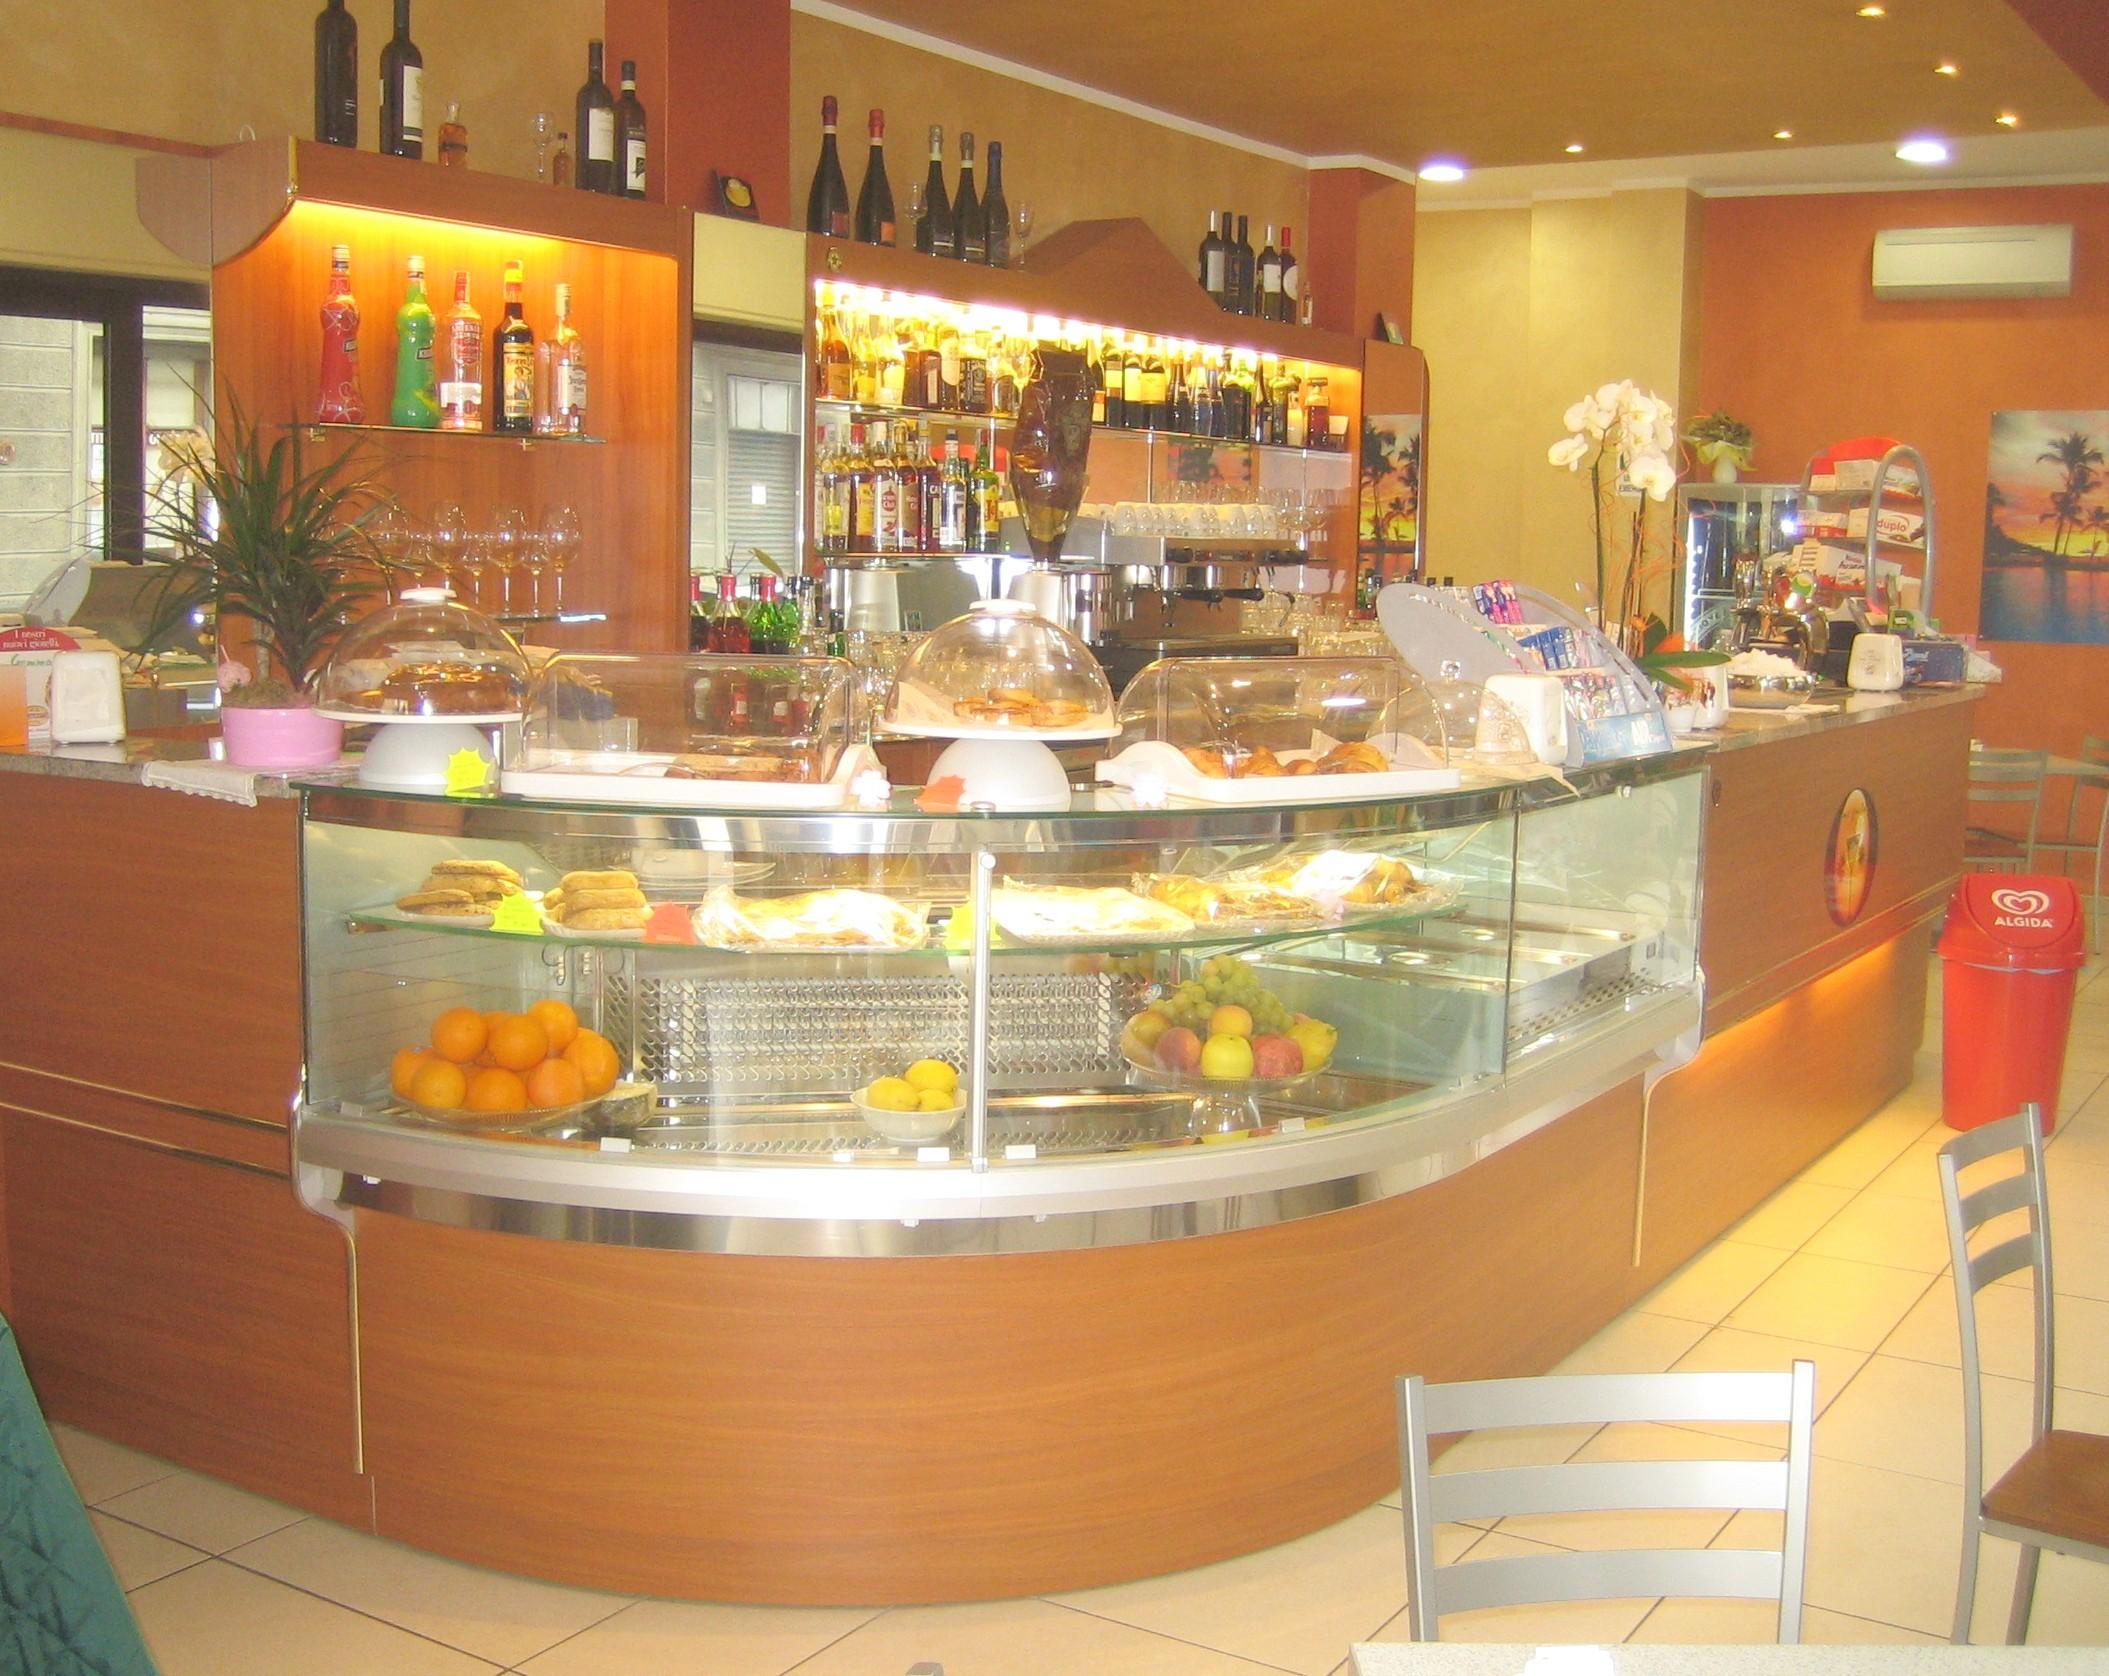 Banchi bar compra in fabbrica a met prezzo novit bar for Banconi bar milano